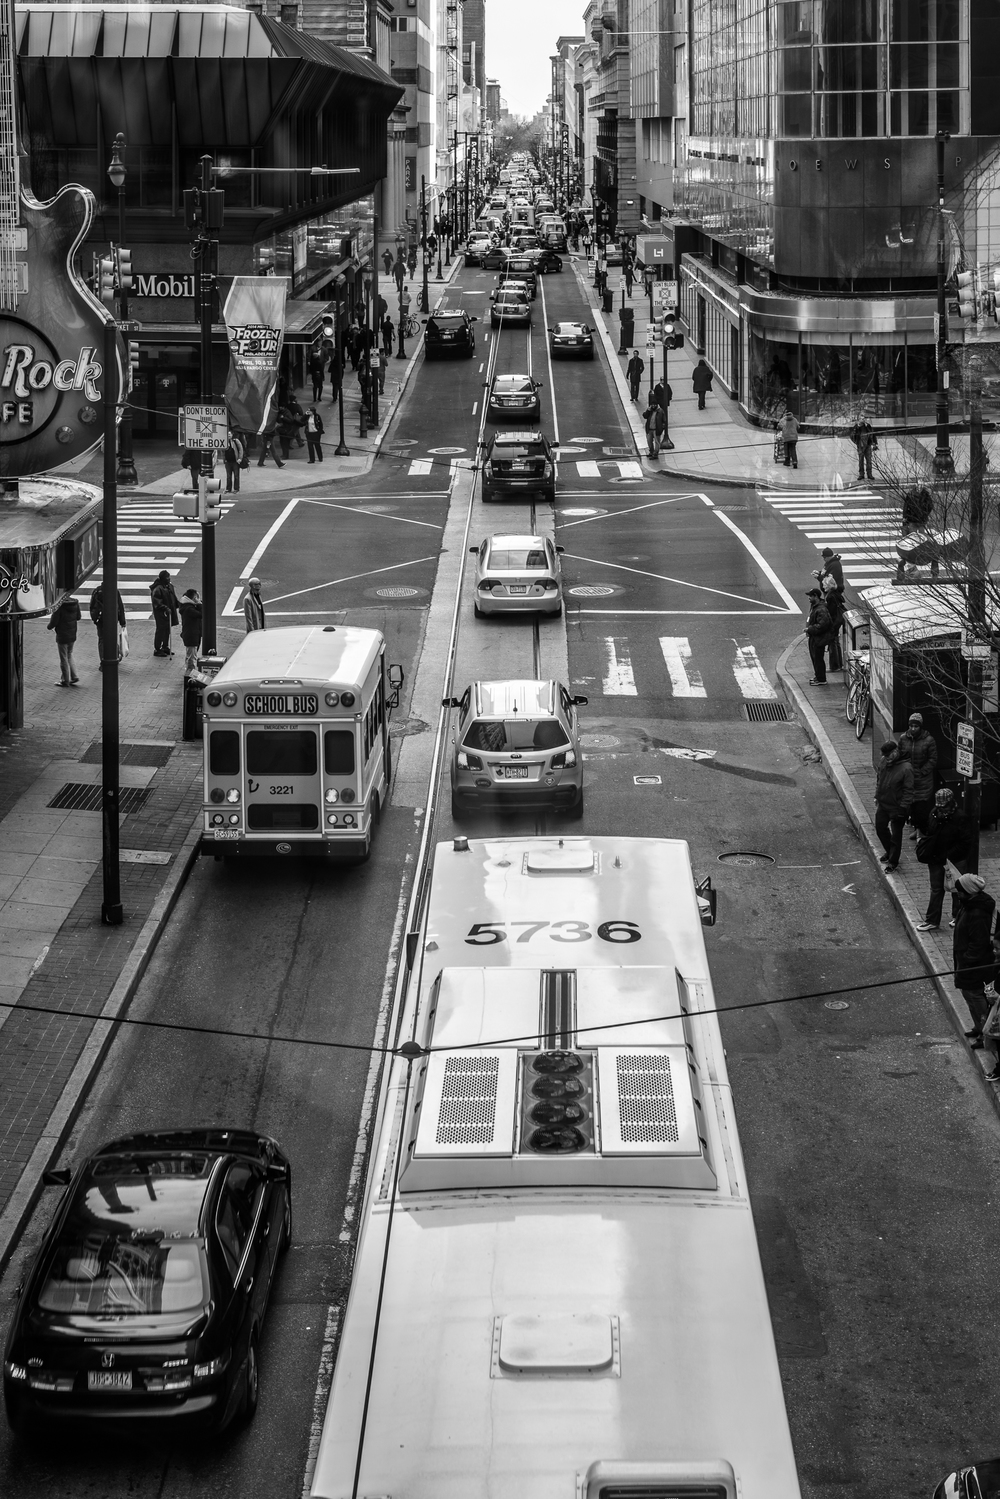 city view, 2014